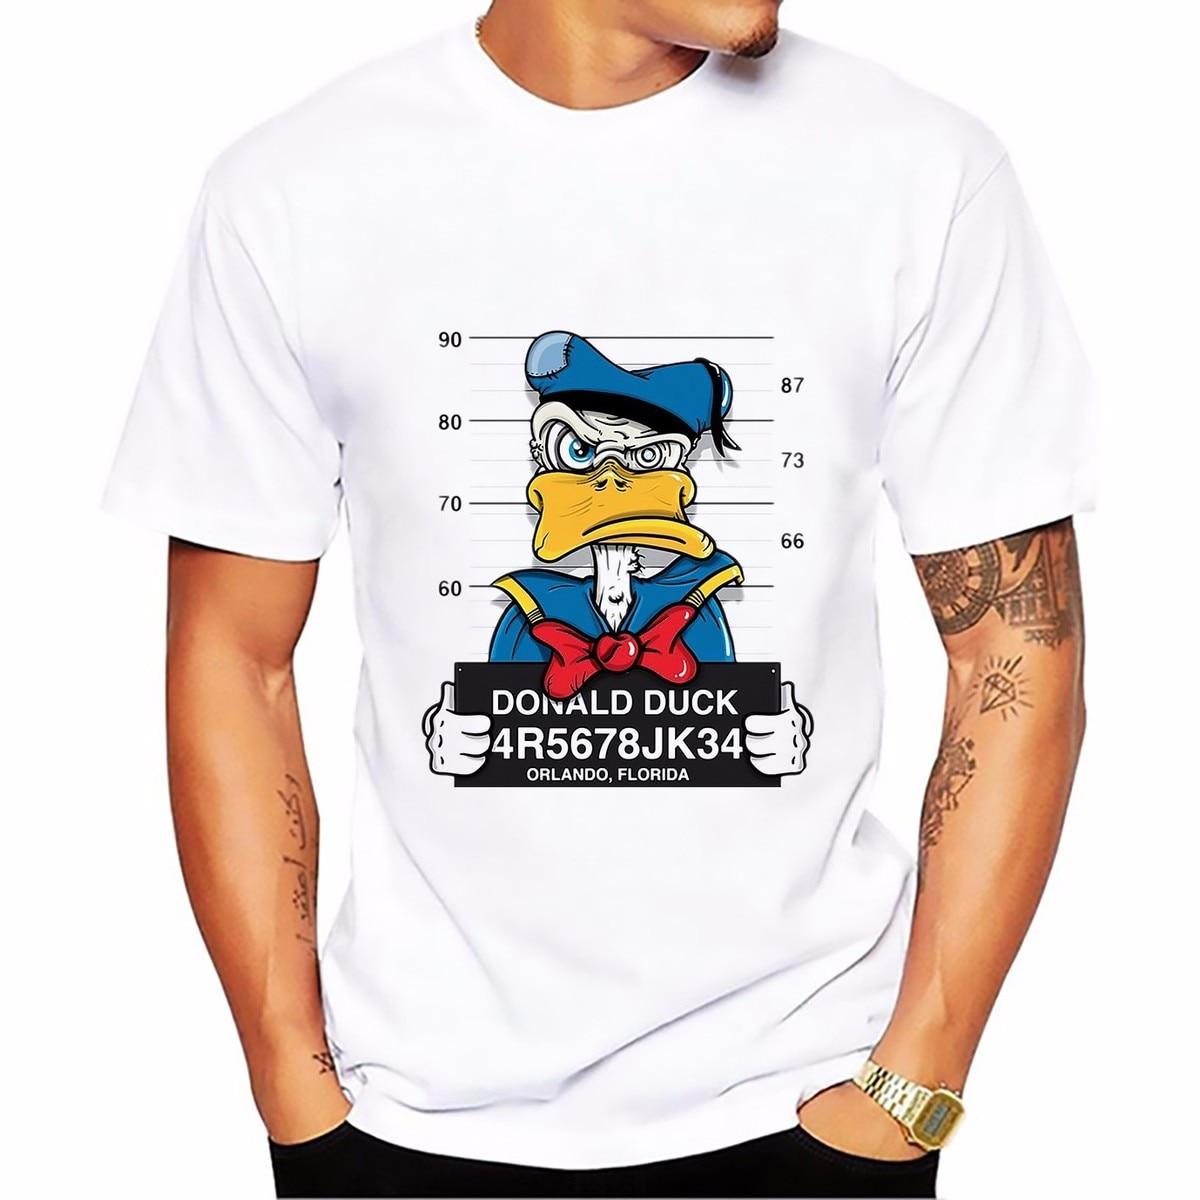 Anime t-shirt MÄNNER TOPS kurzarm casual lustige cartoon hund maus ente t-shirt homme komfort plus größe t-shirt